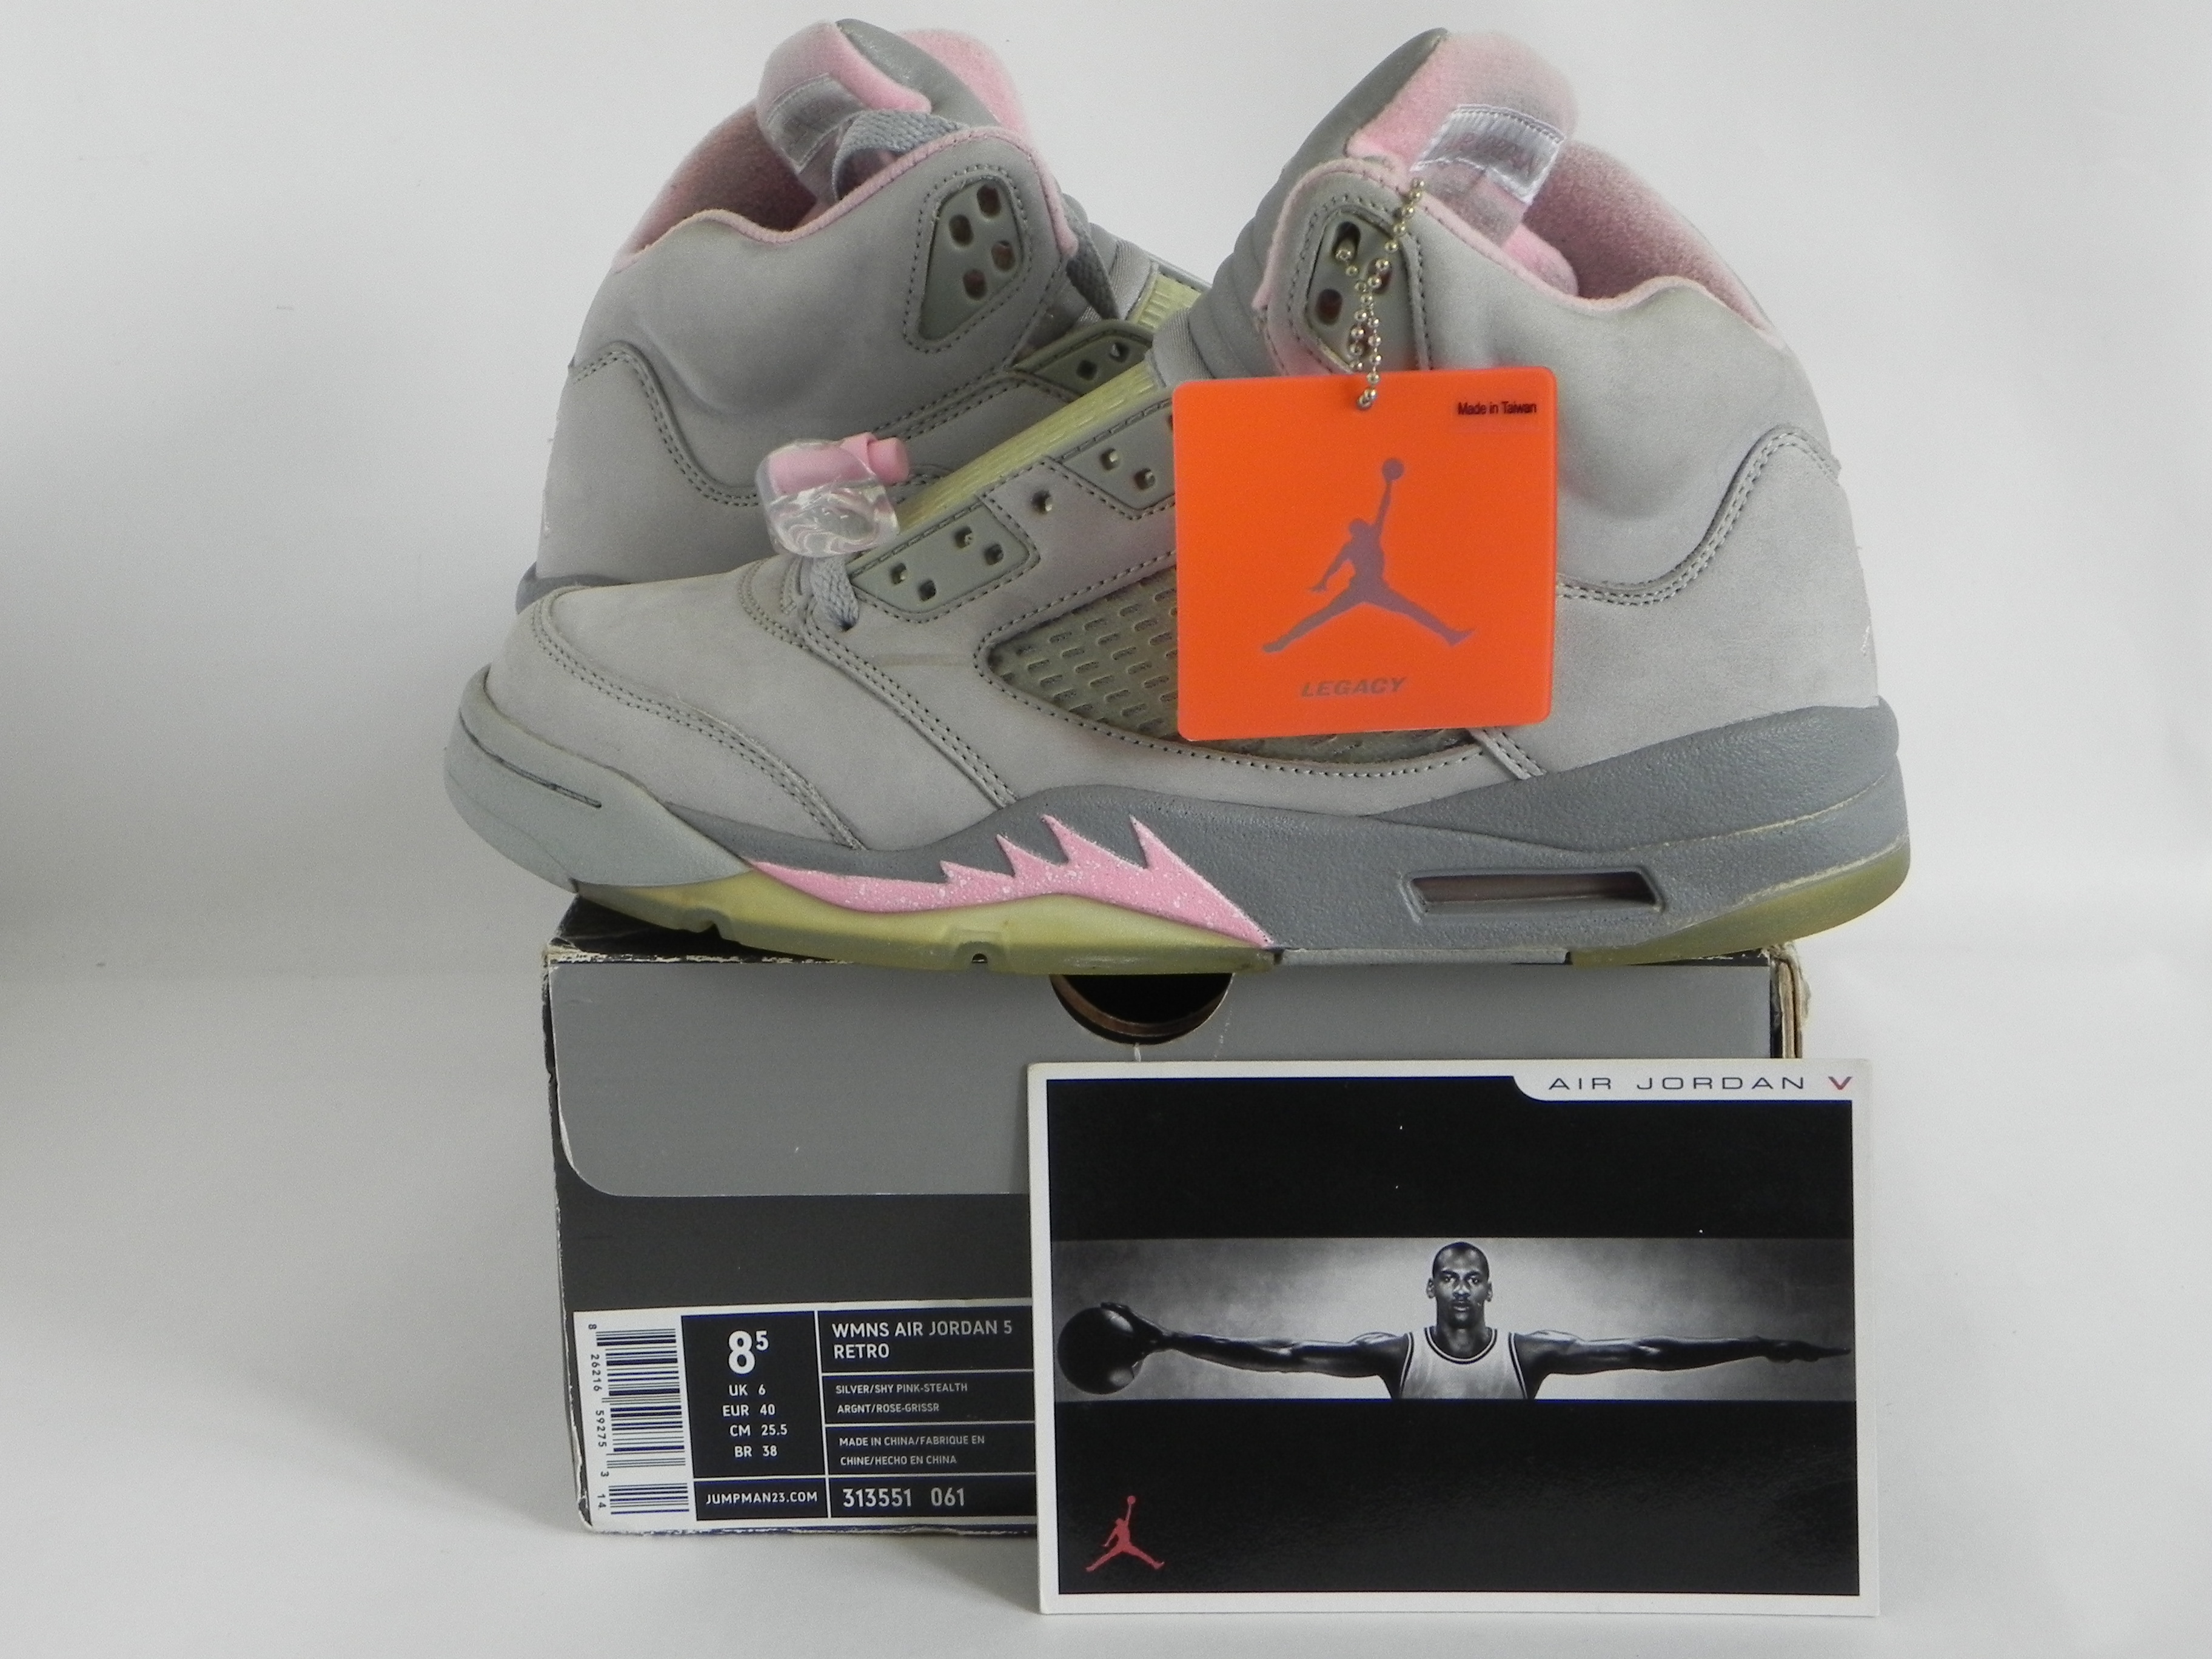 bf56b9011a6 Jordan Brand Shy Pink 5 Air Jordan Size 7 Mens (8.5 Wmn) | Grailed